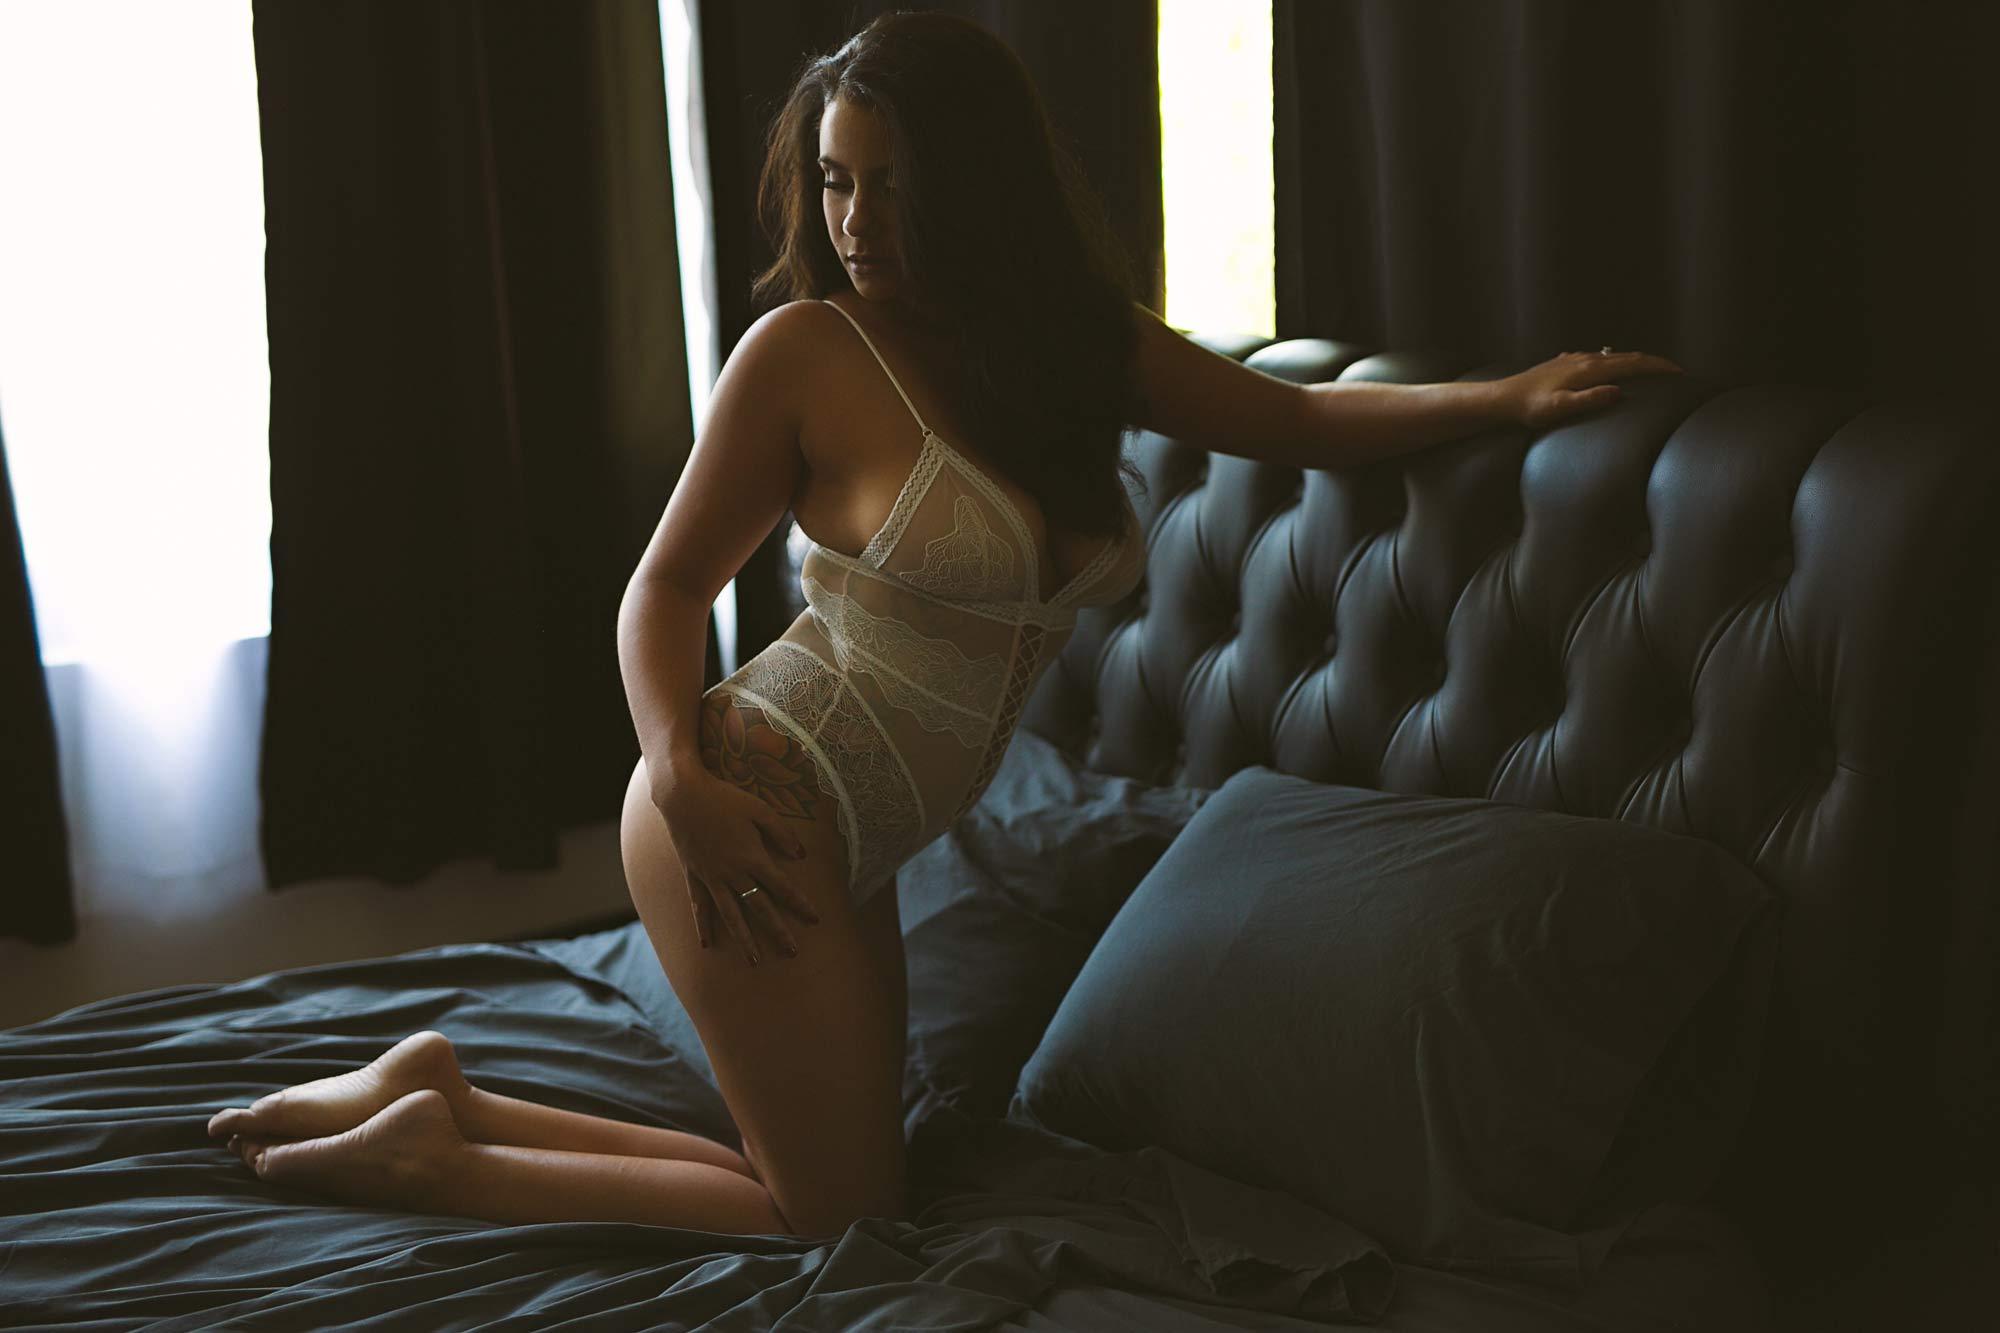 san-francisco-bay-area-boudoir-photographer